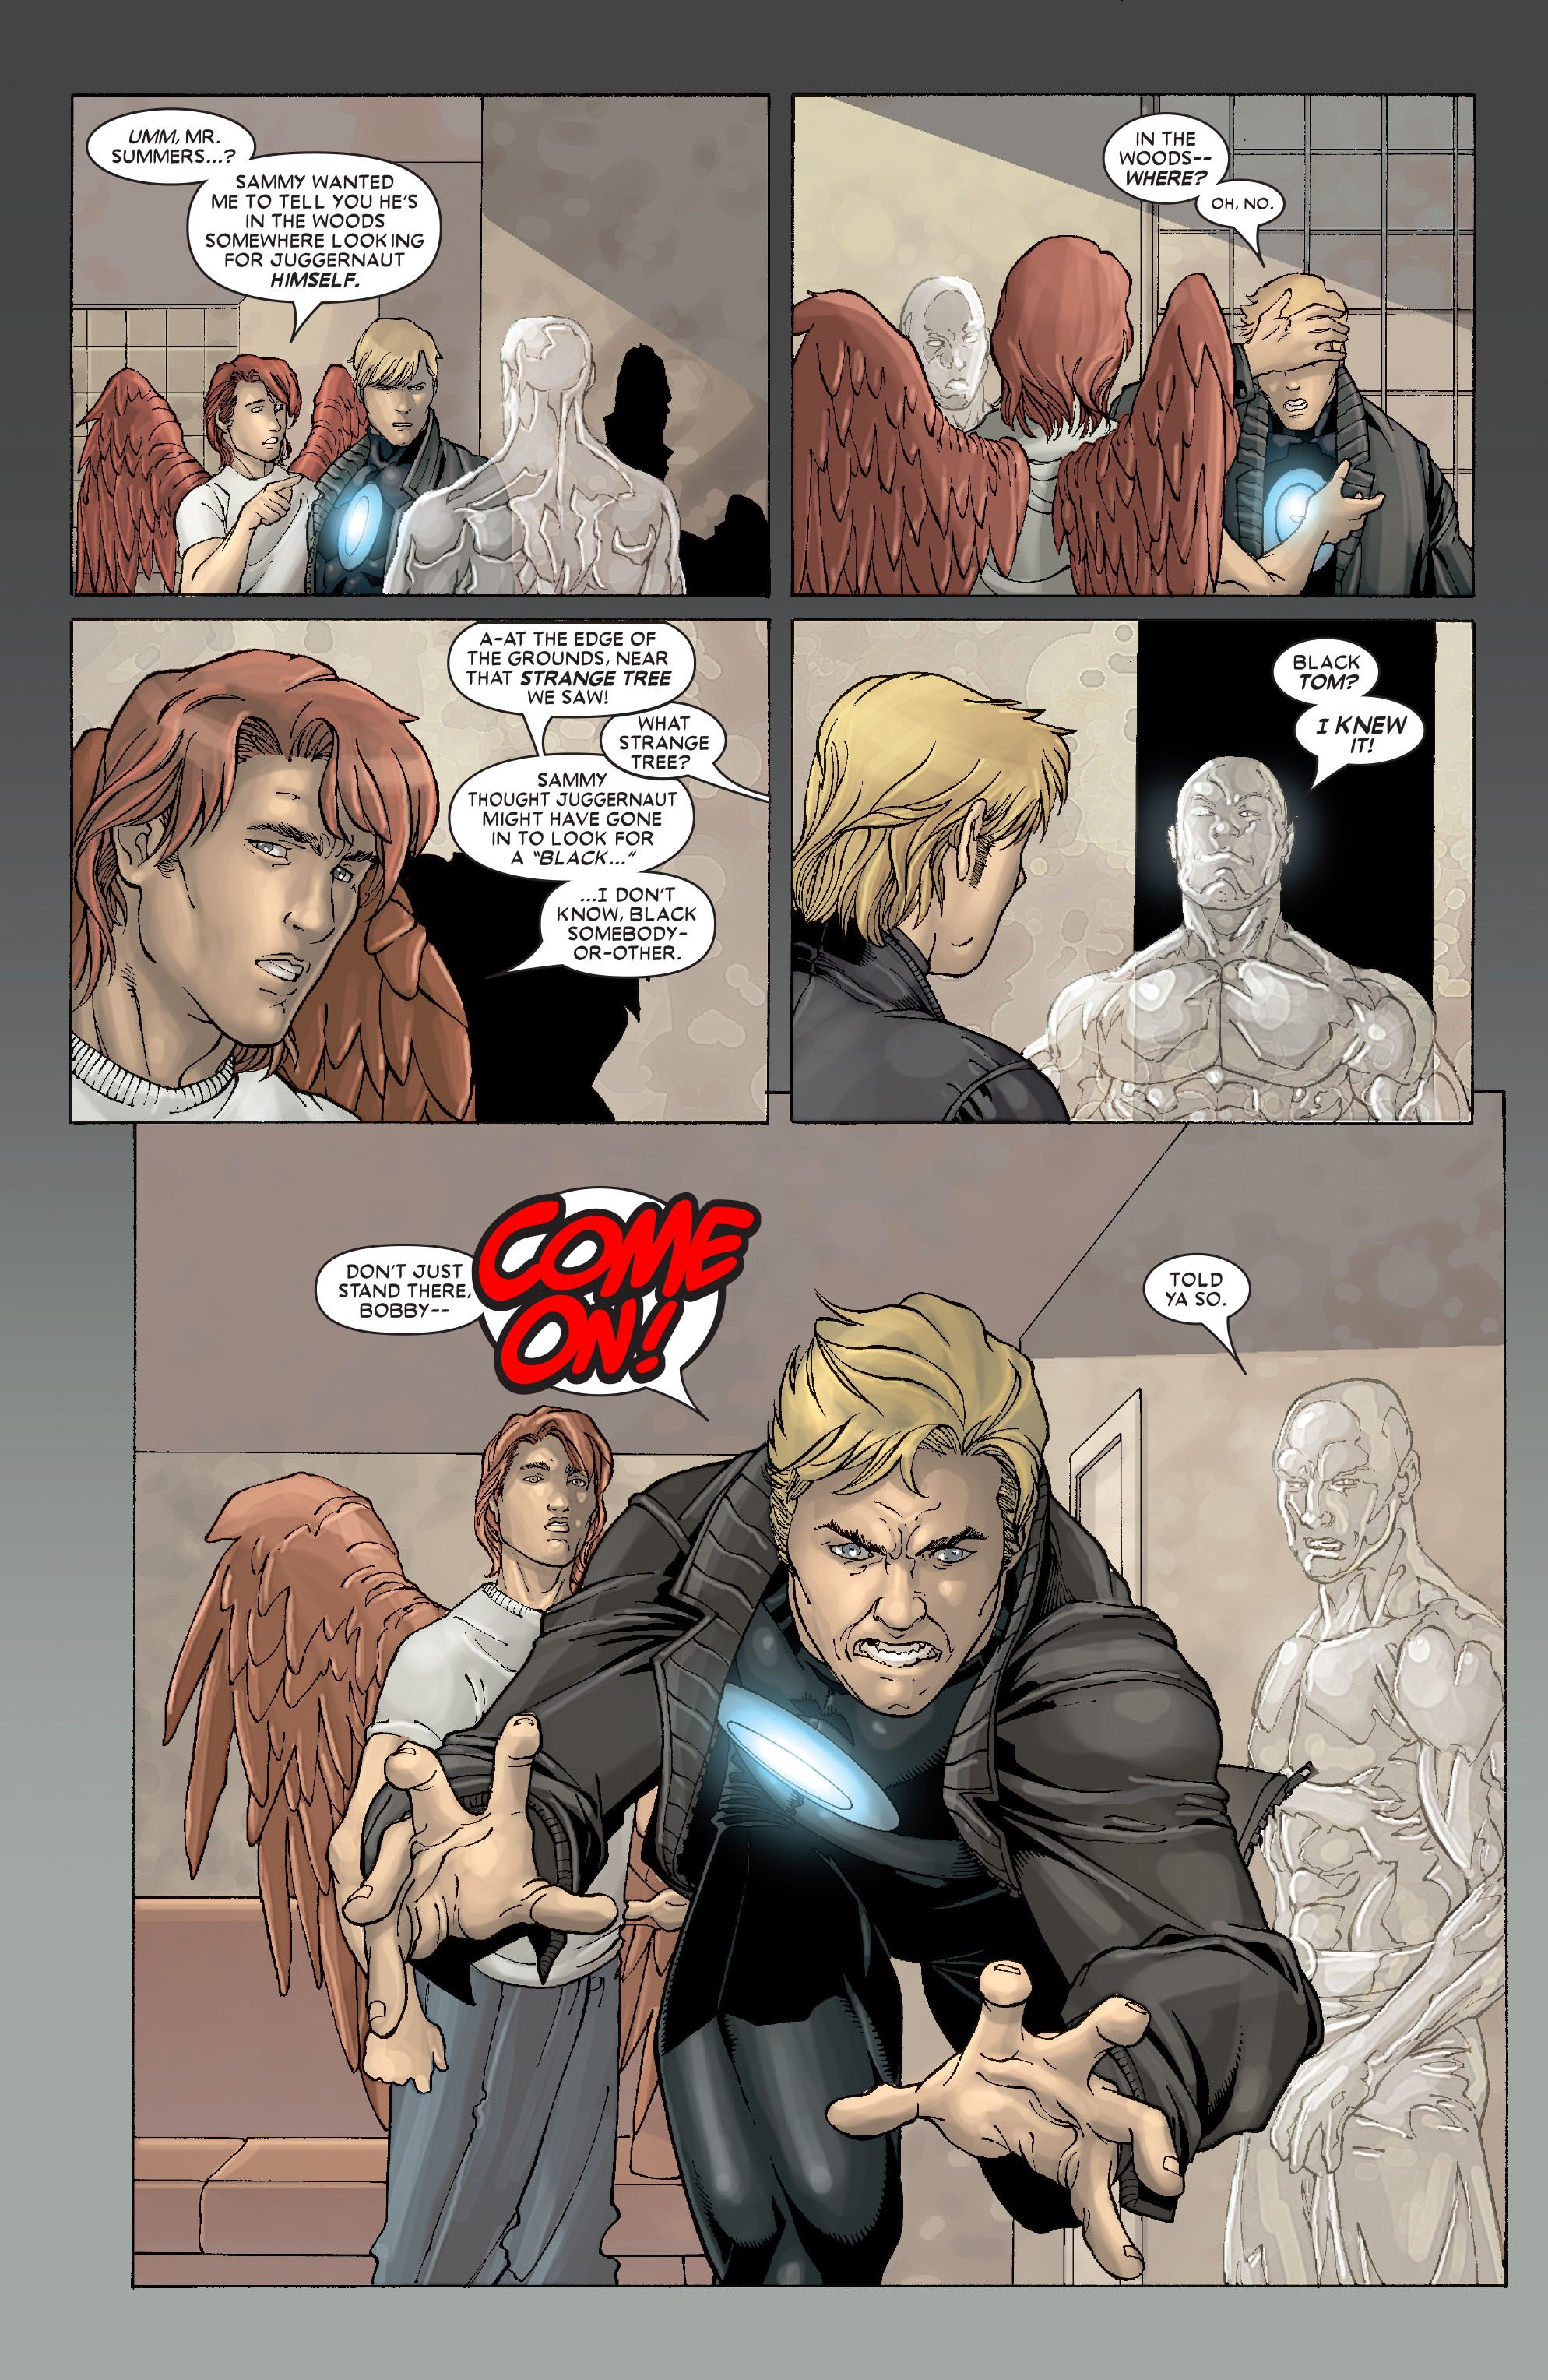 X-Men (1991) 162 Page 10